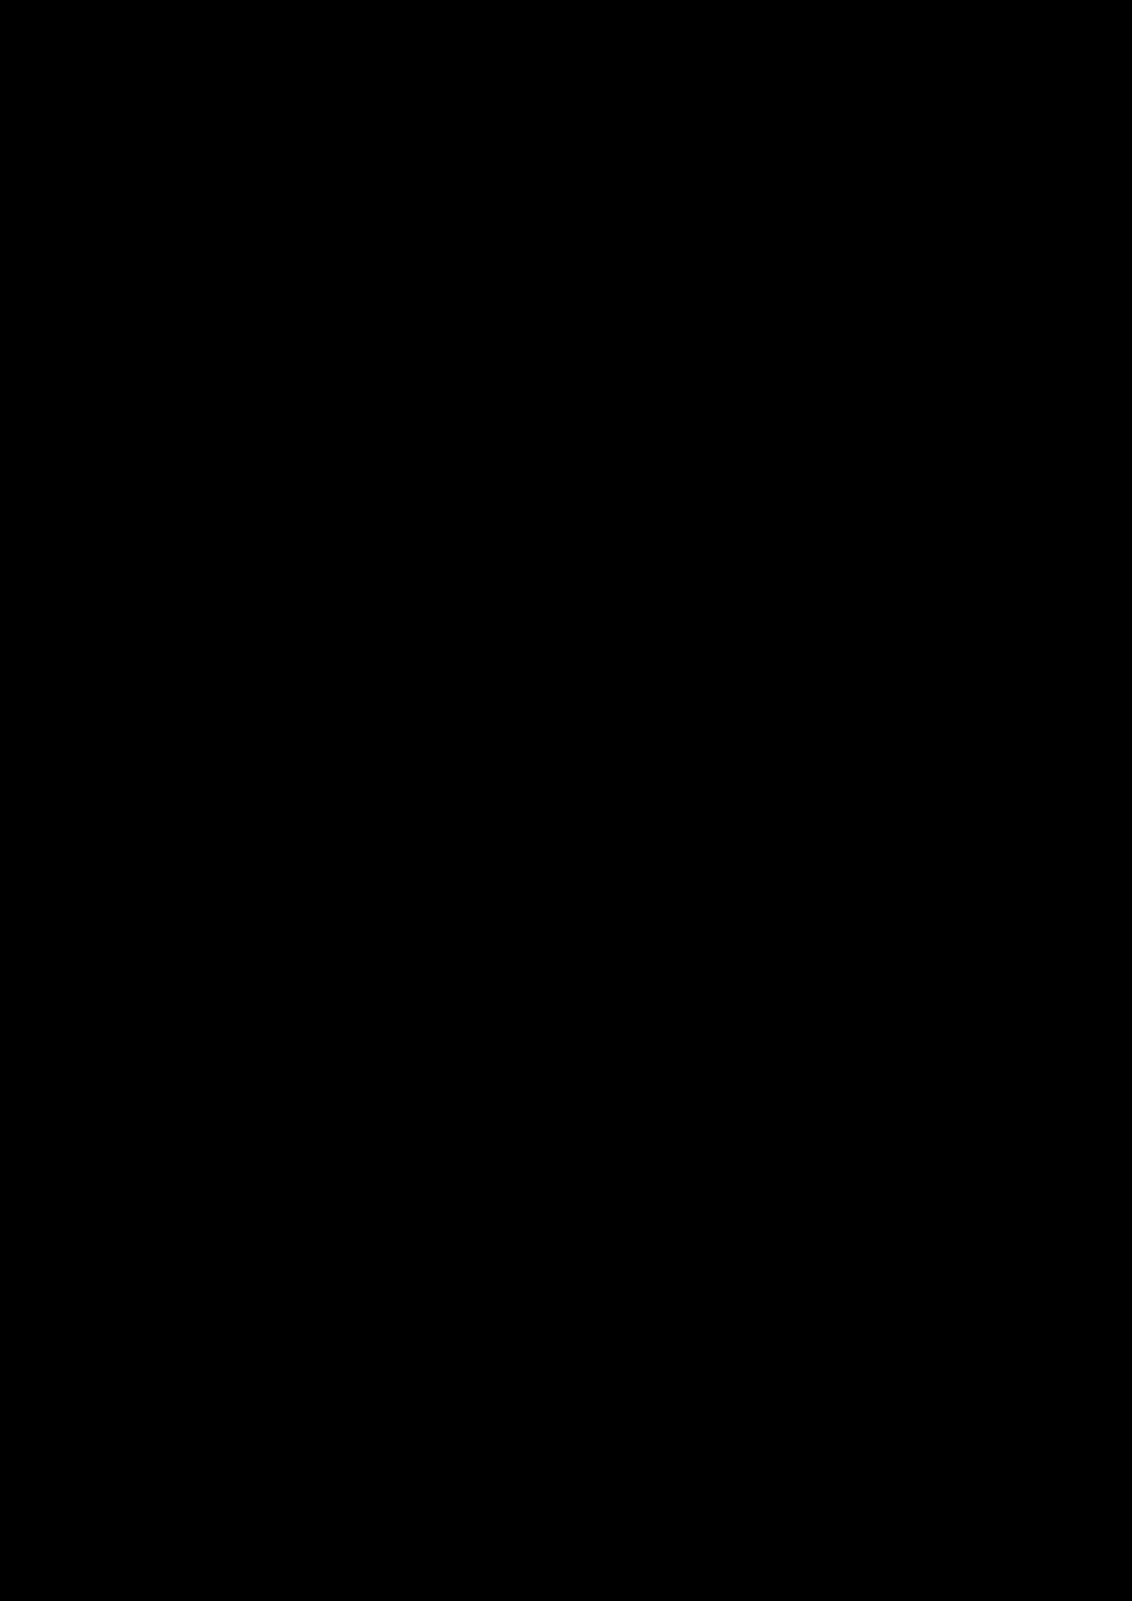 Korolevstvo slez slide, Image 83